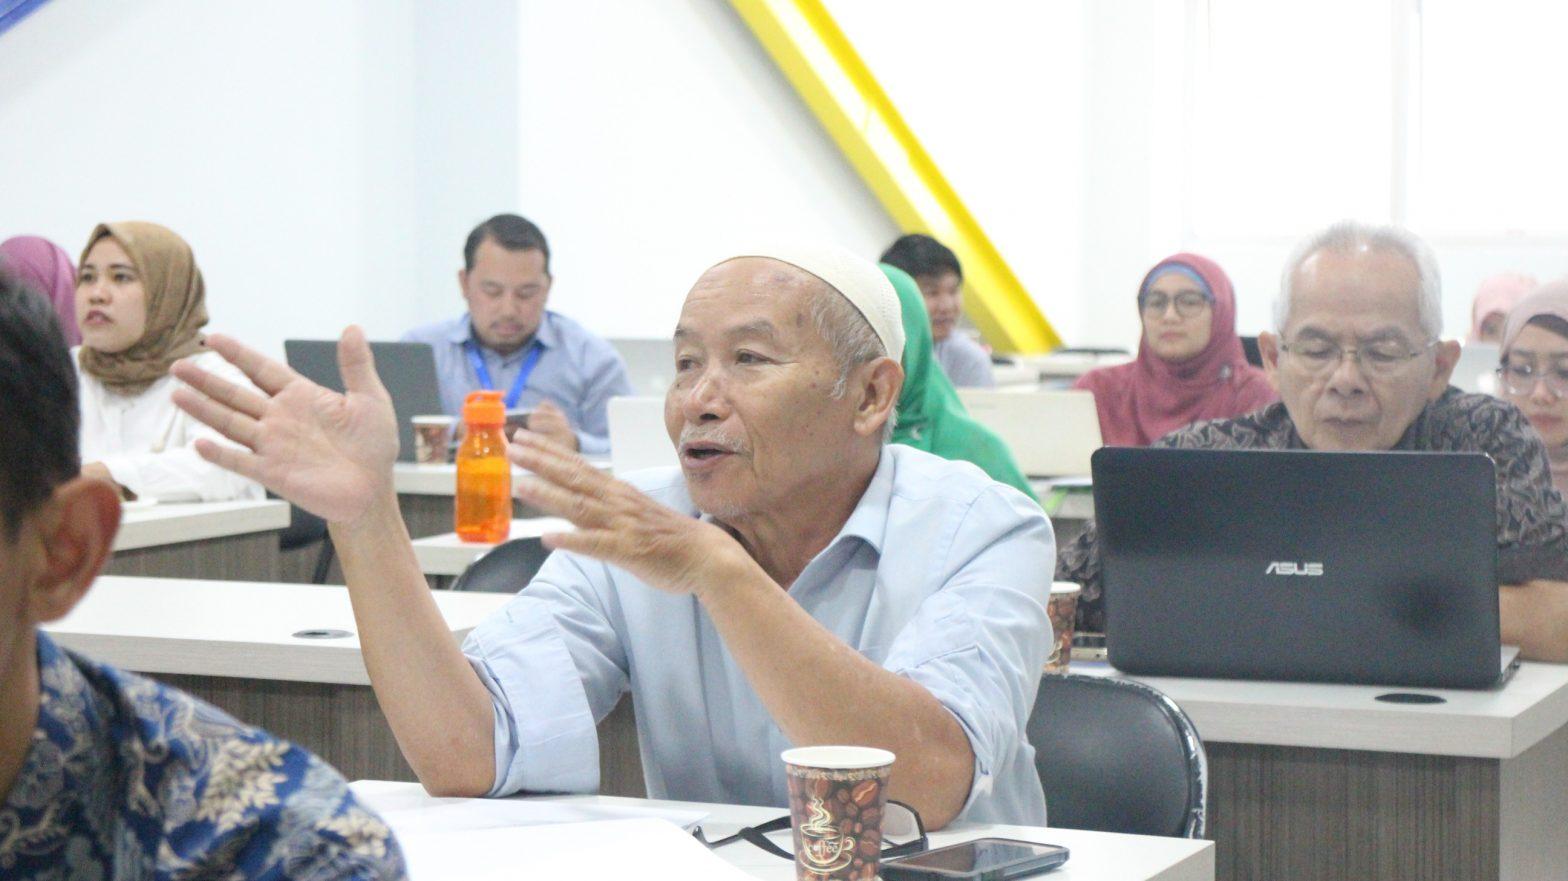 LOKAKARYA INTERNAL KURIKULUM PROGRAM STUDI SARJANA FARMASI (PSSF) DAN PROGRAM STUDI PROFESI APOTEKER (PSPA) SEKOLAH TINGGI FARMASI INDONESIA (STFI)